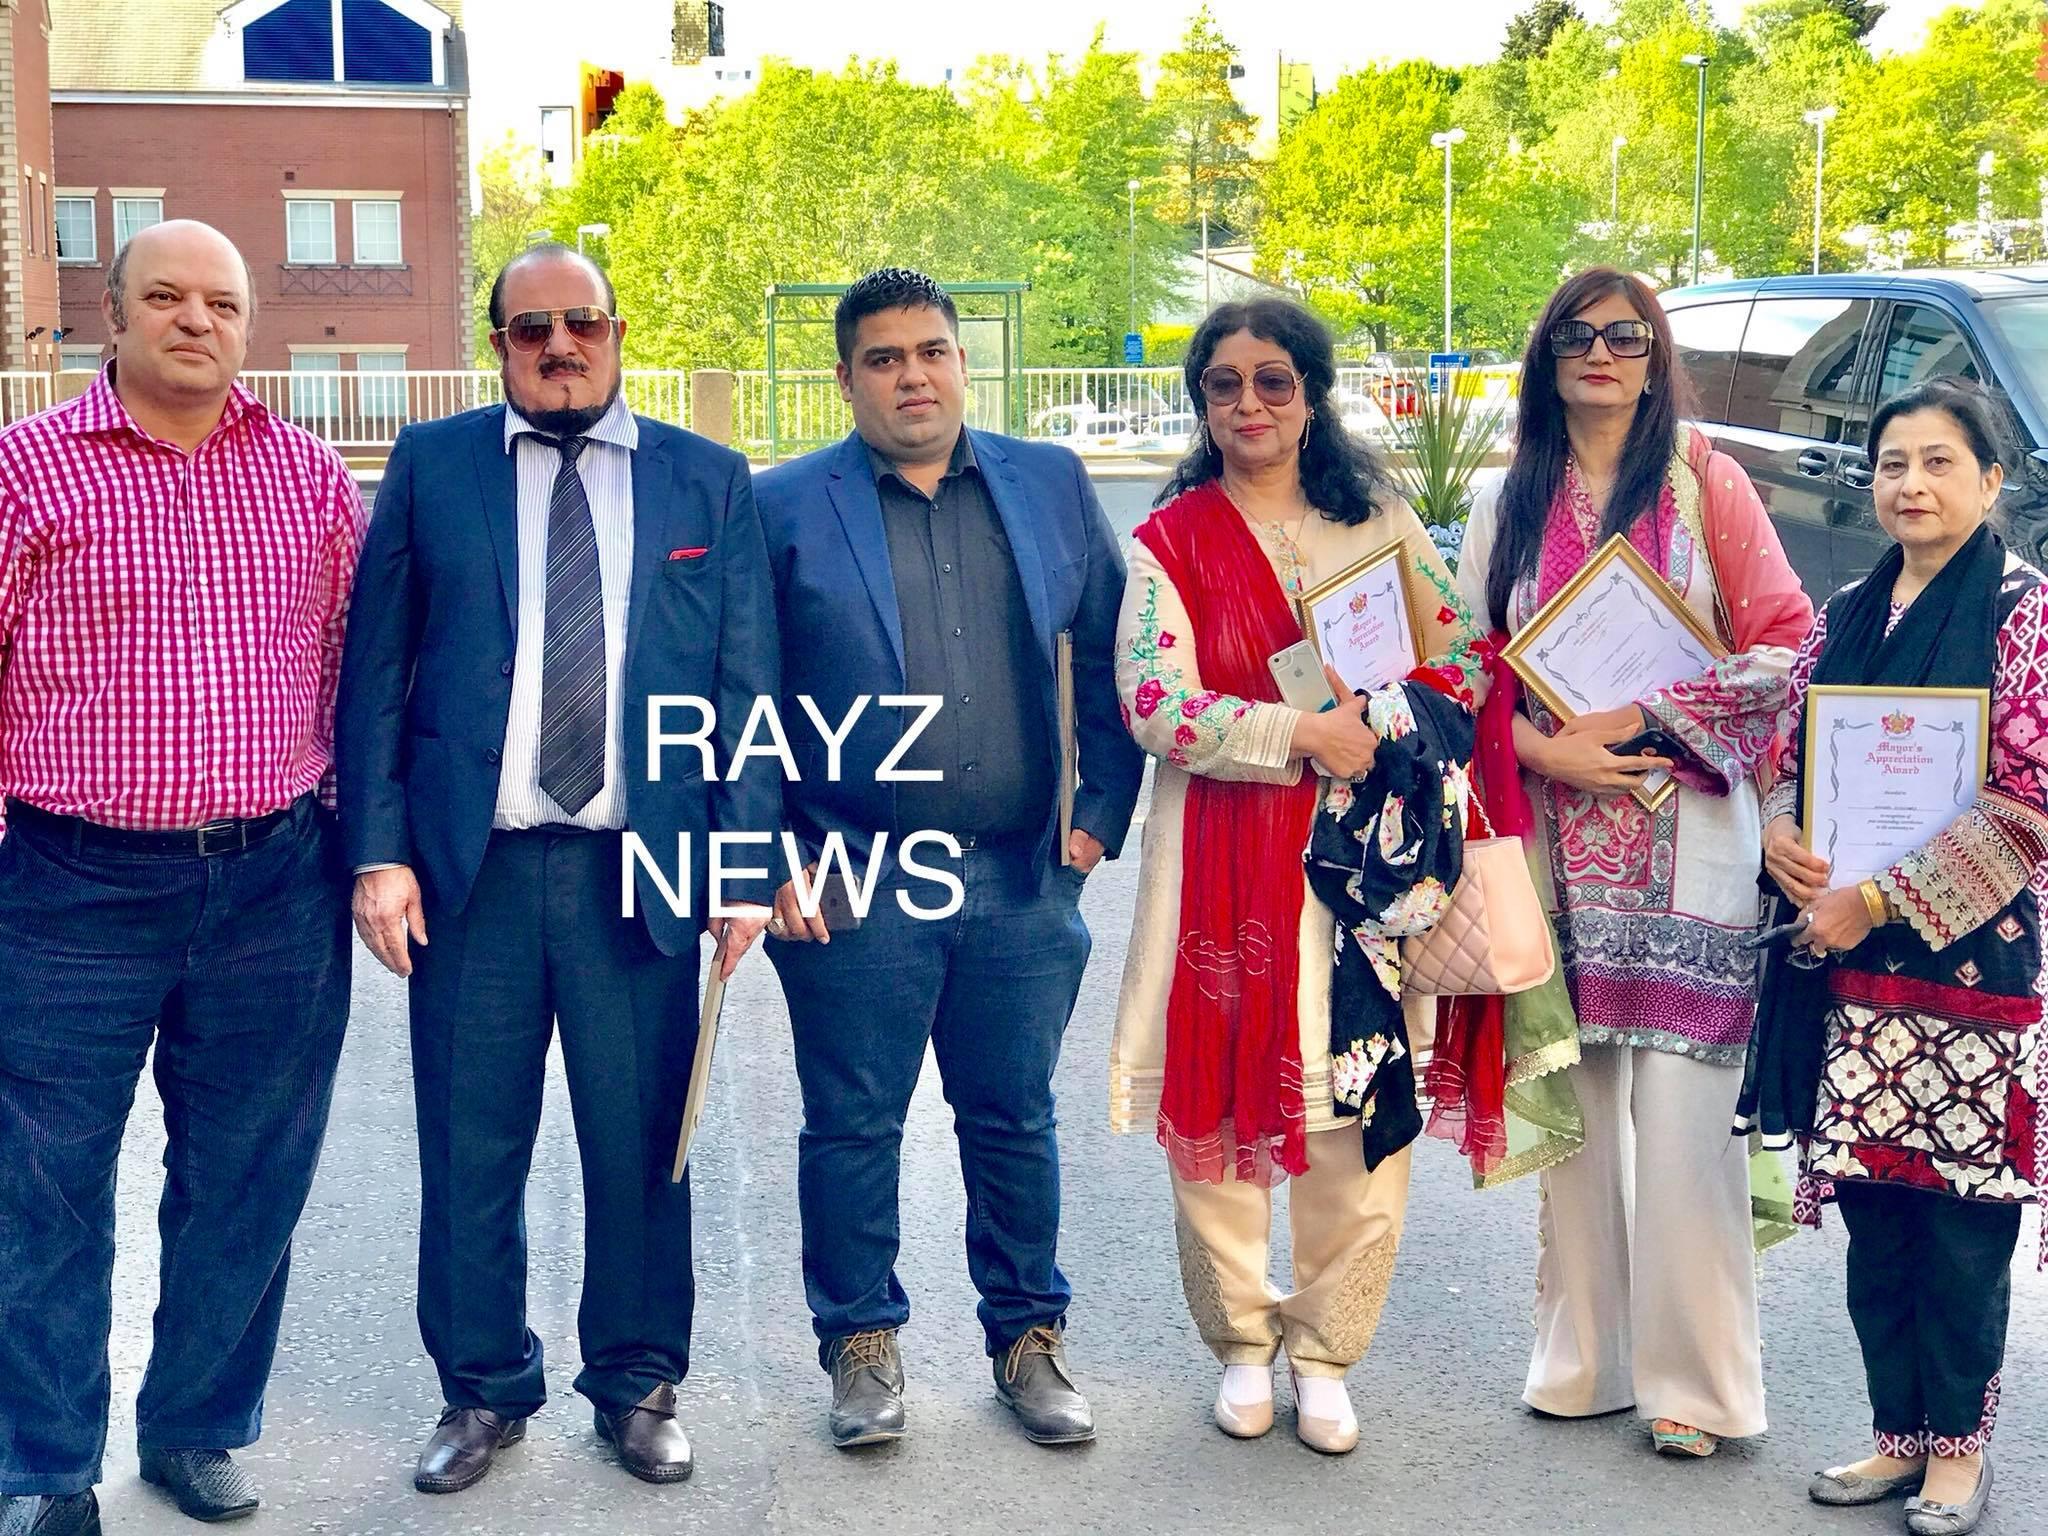 Mayor of Oldham Shadab Qamar invited